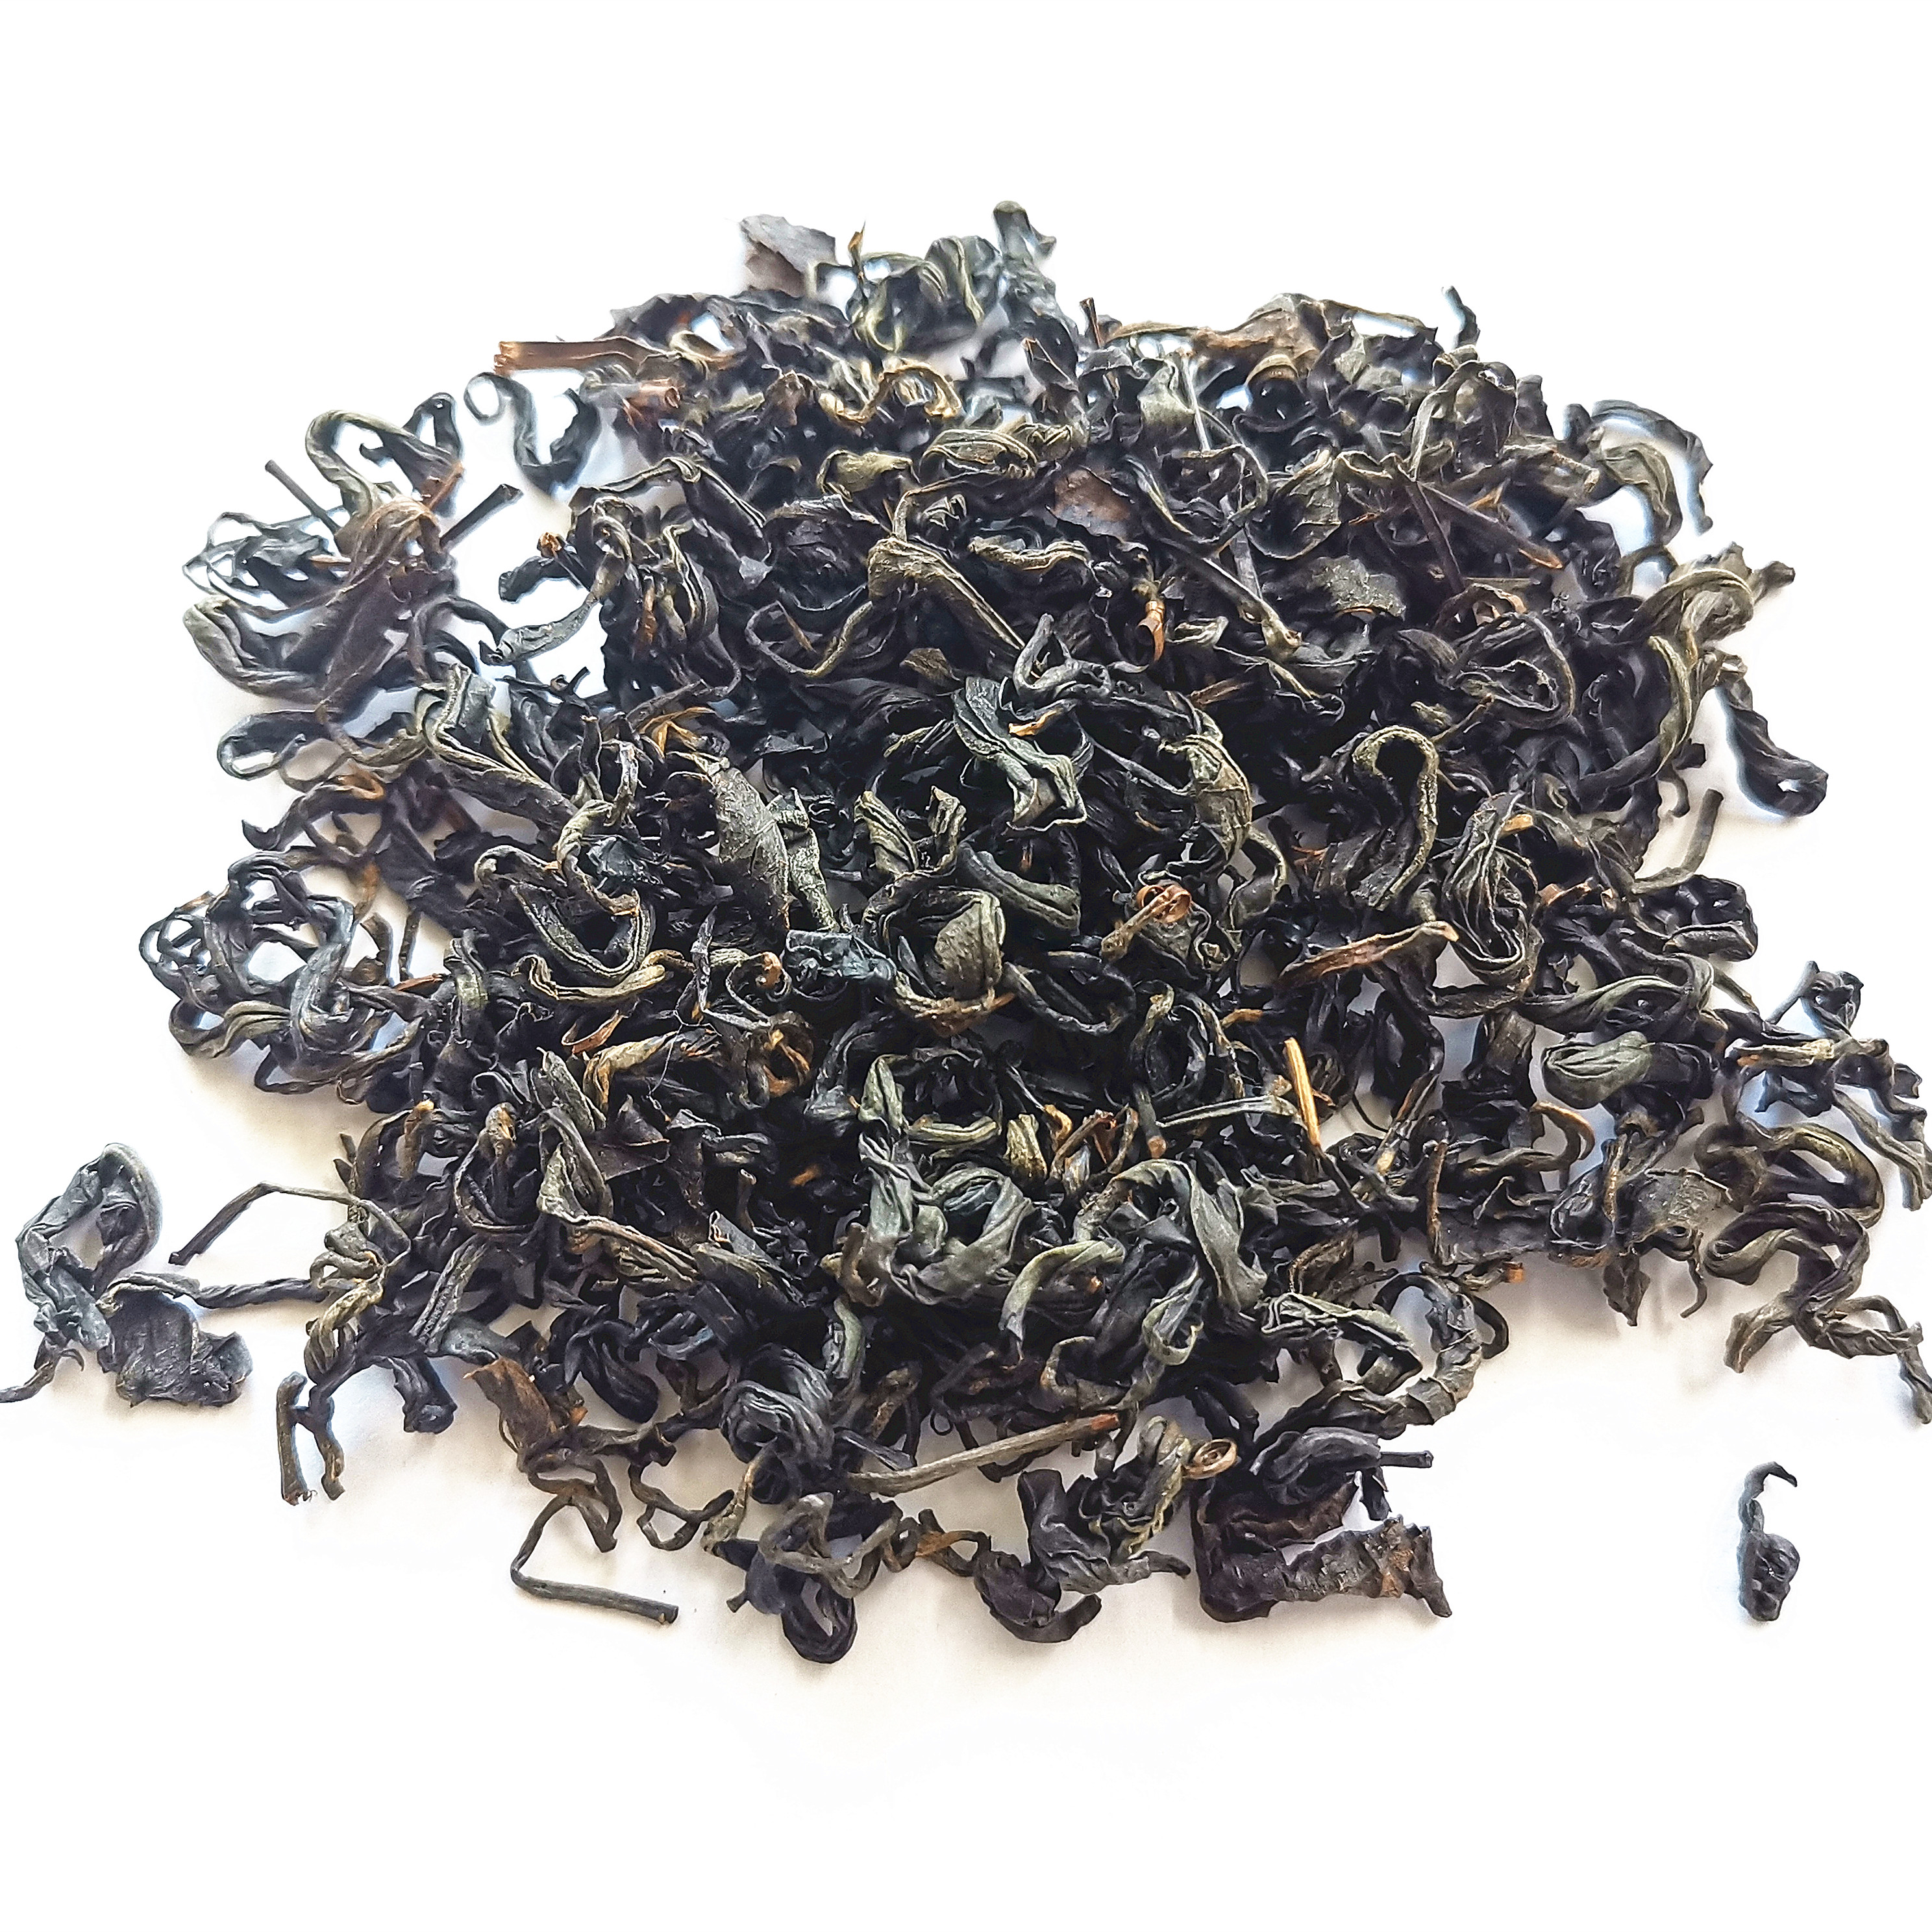 A-dragon black tea high mountain quality slimming organic black tea - 4uTea   4uTea.com